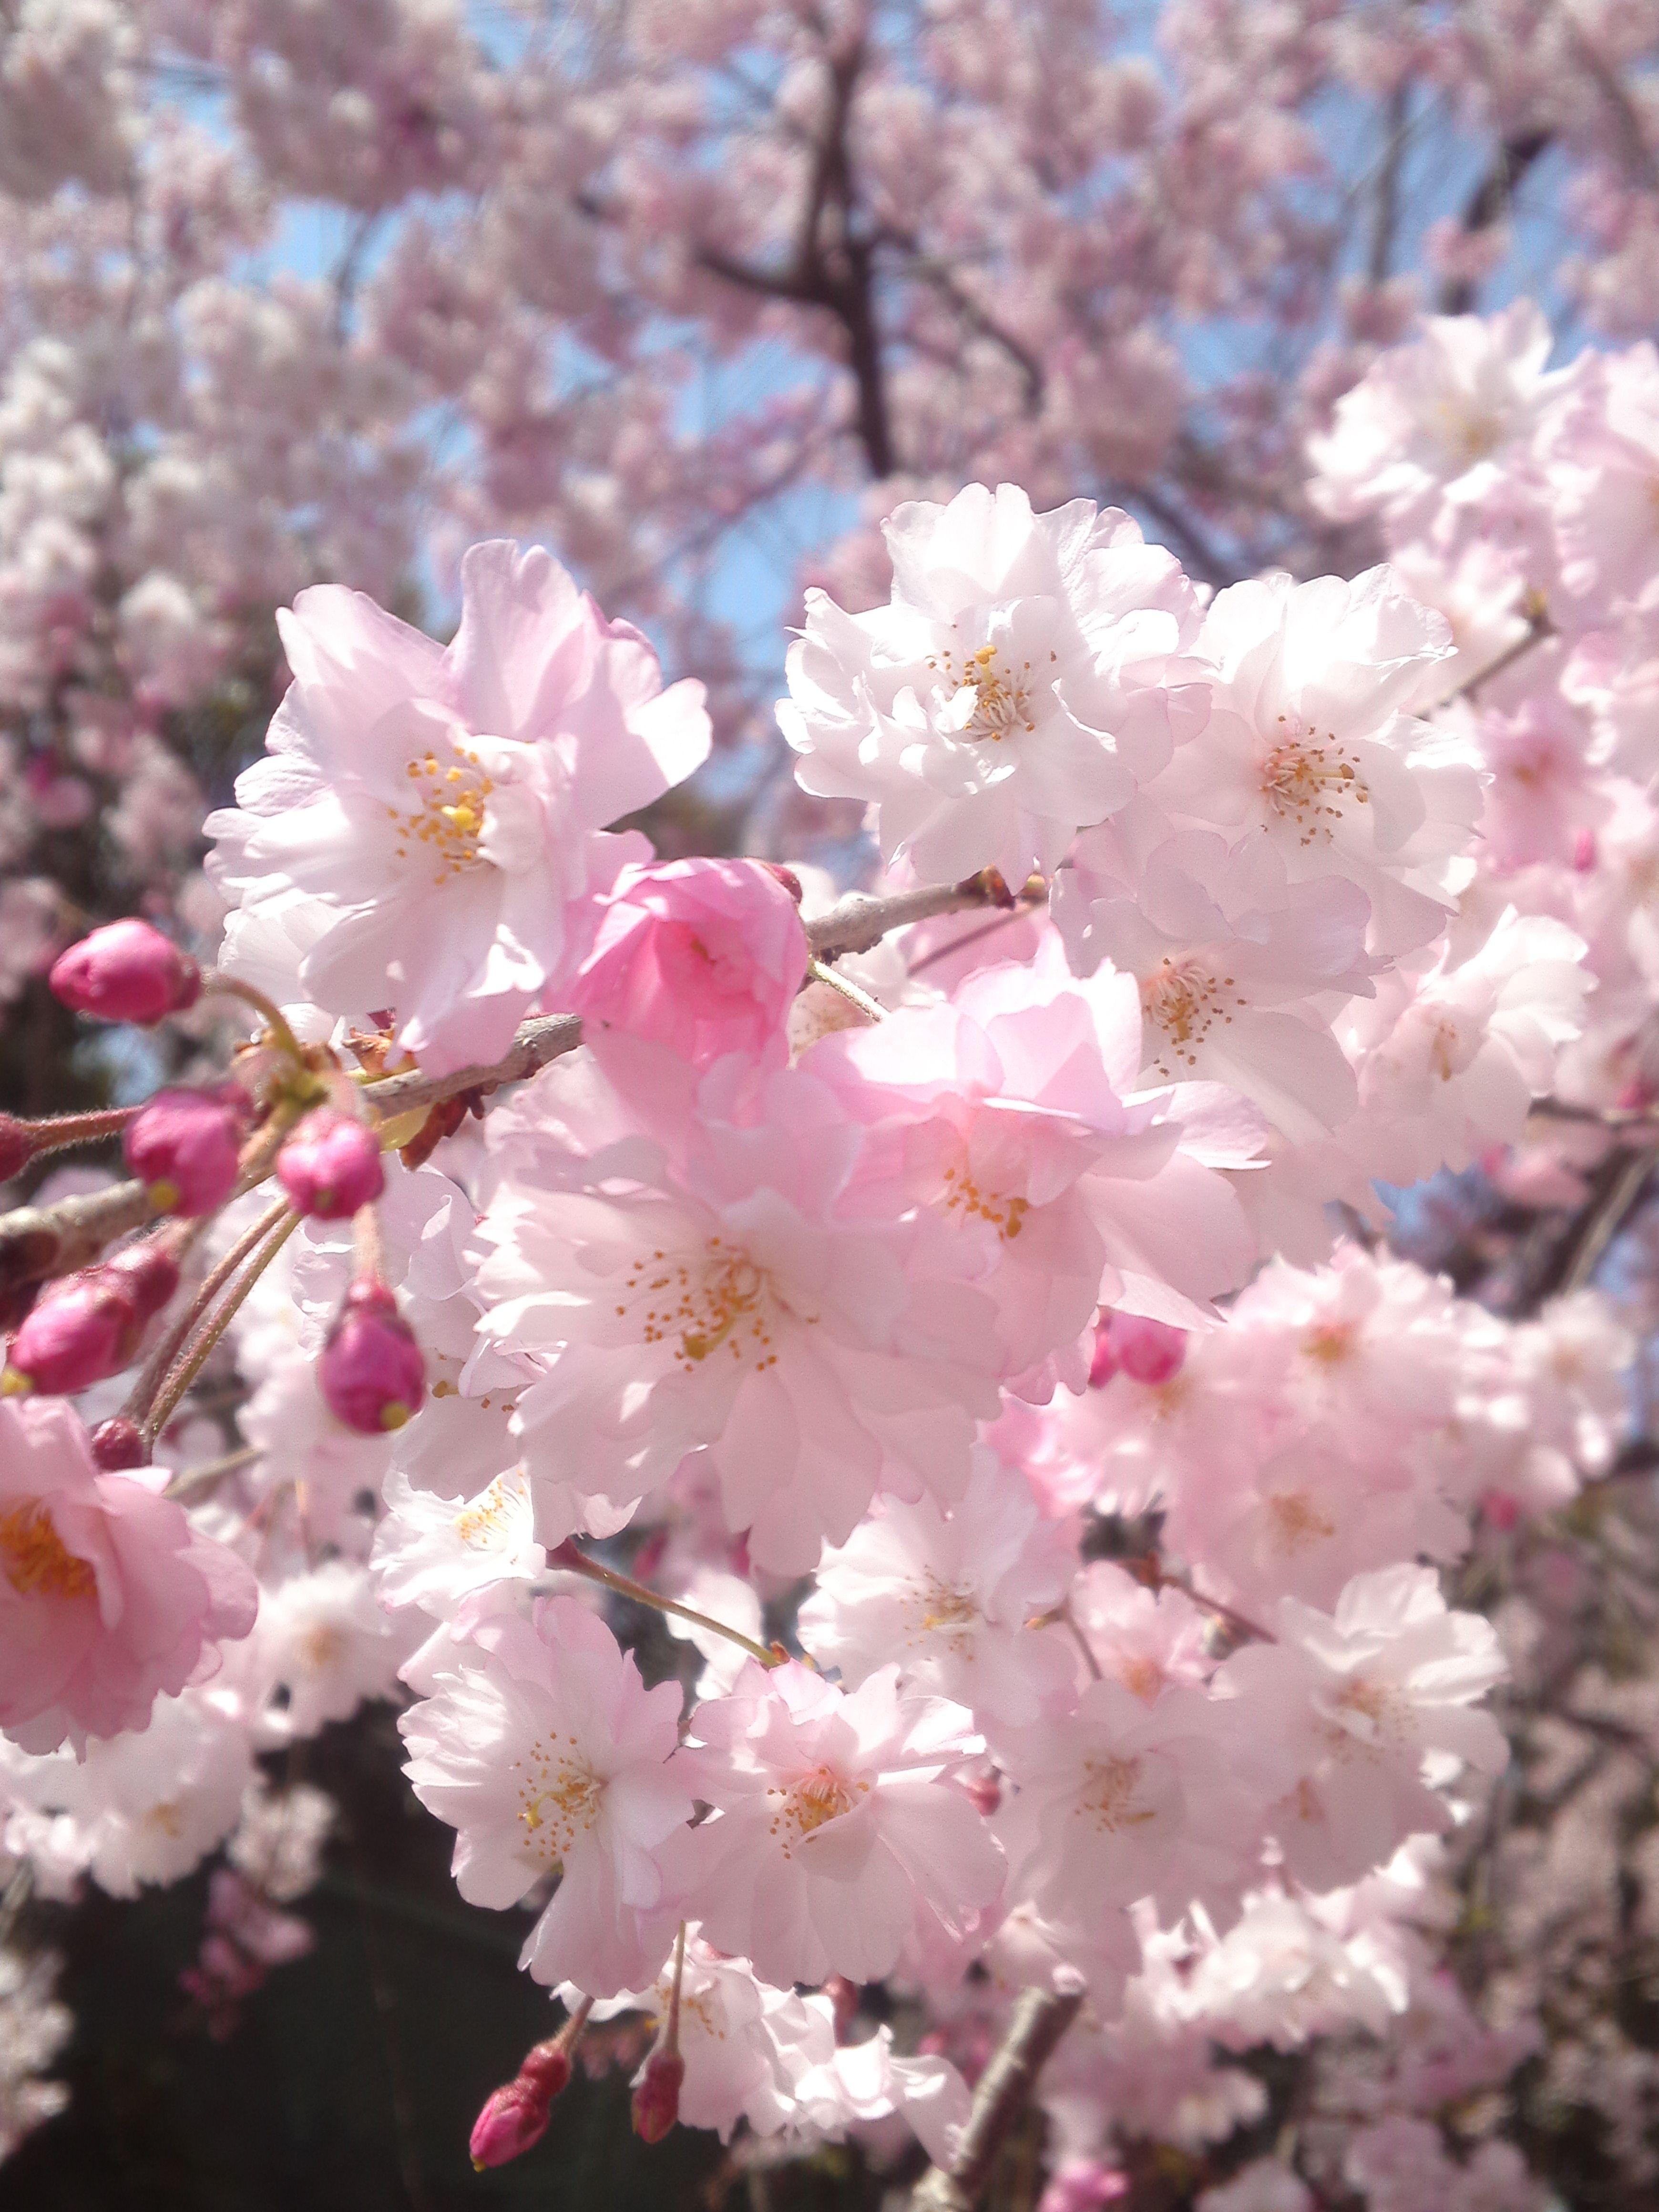 Flower Close Up Of Cherry Blossom Hd Desktop Wallpaper Free High Cherry Blossom Wallpaper Apricot Blossom Cherry Blossom Flowers